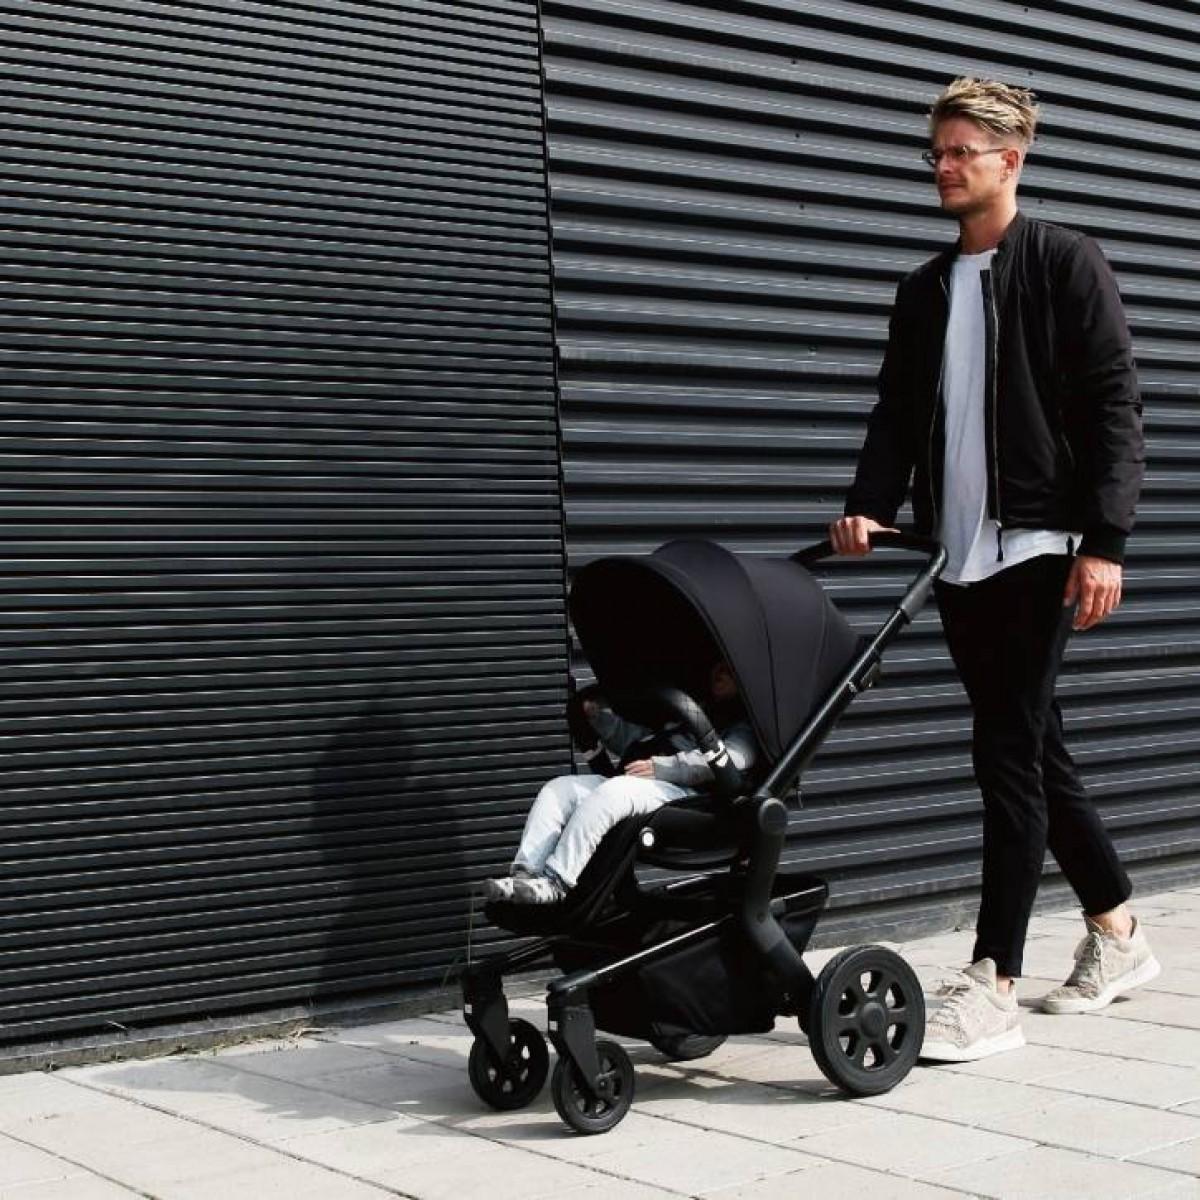 Joolz Hub Nero Full Black Compact All Terrian Stroller